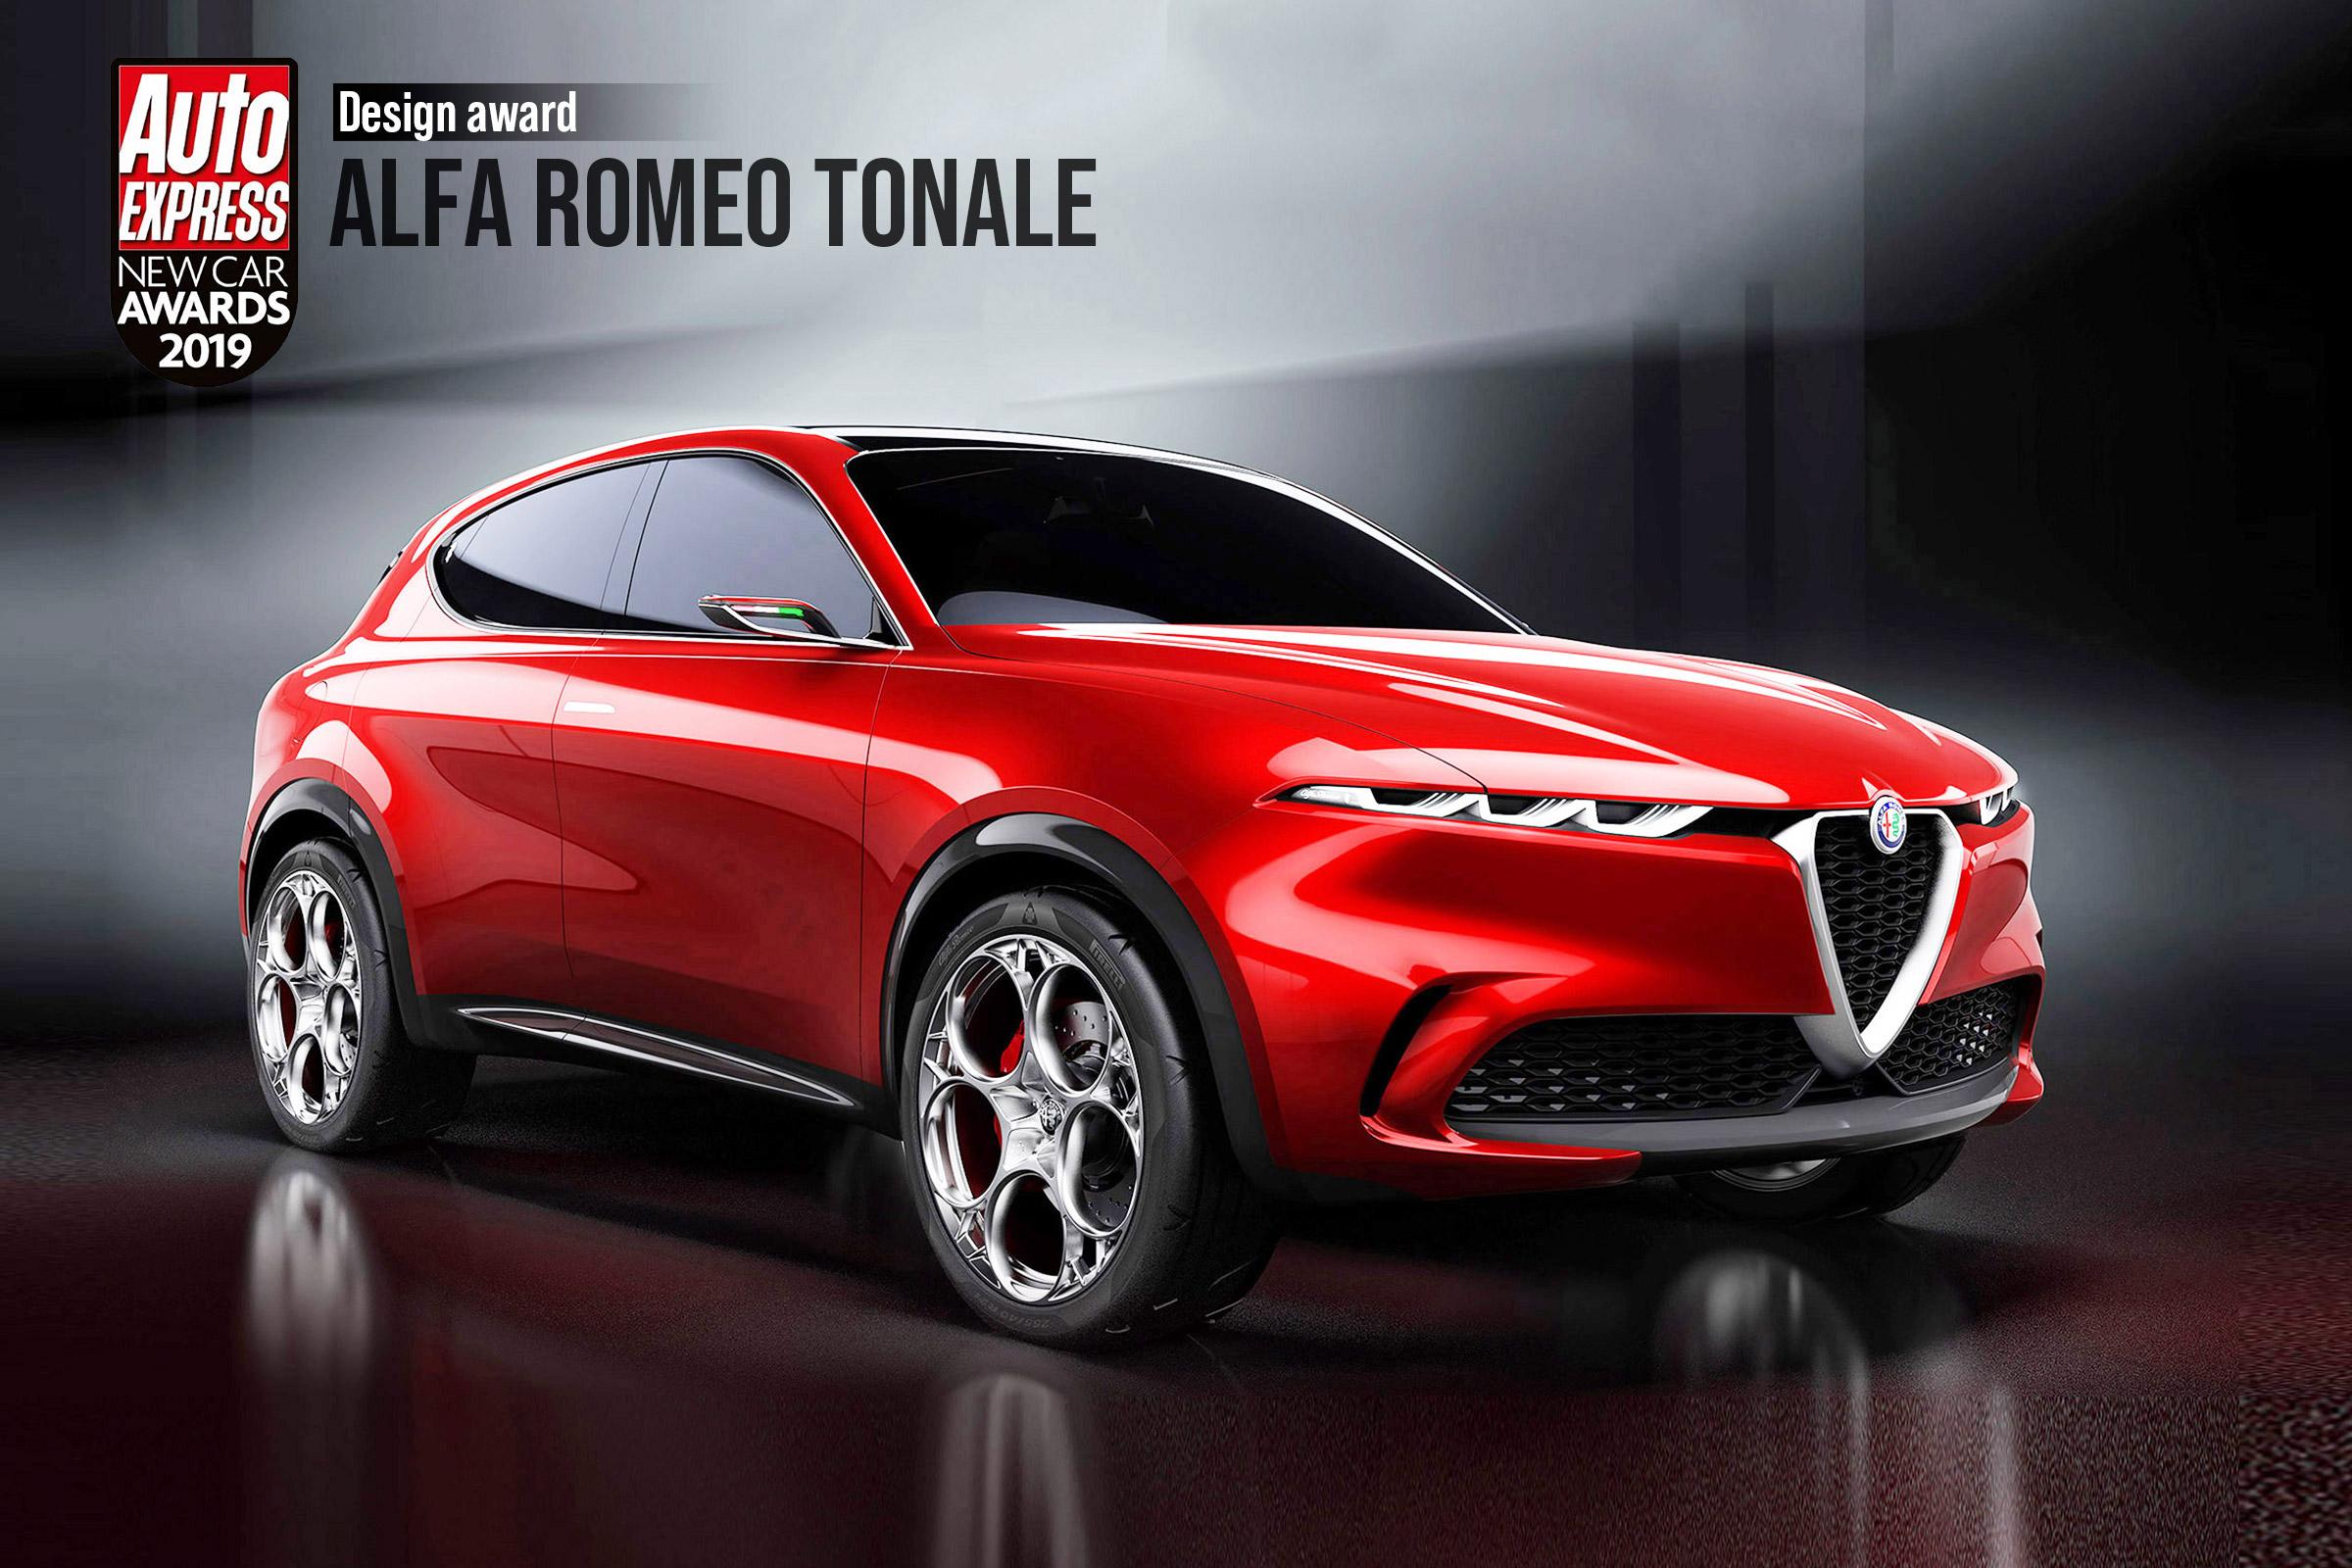 Design Award 2019 Alfa Romeo Tonale Auto Express